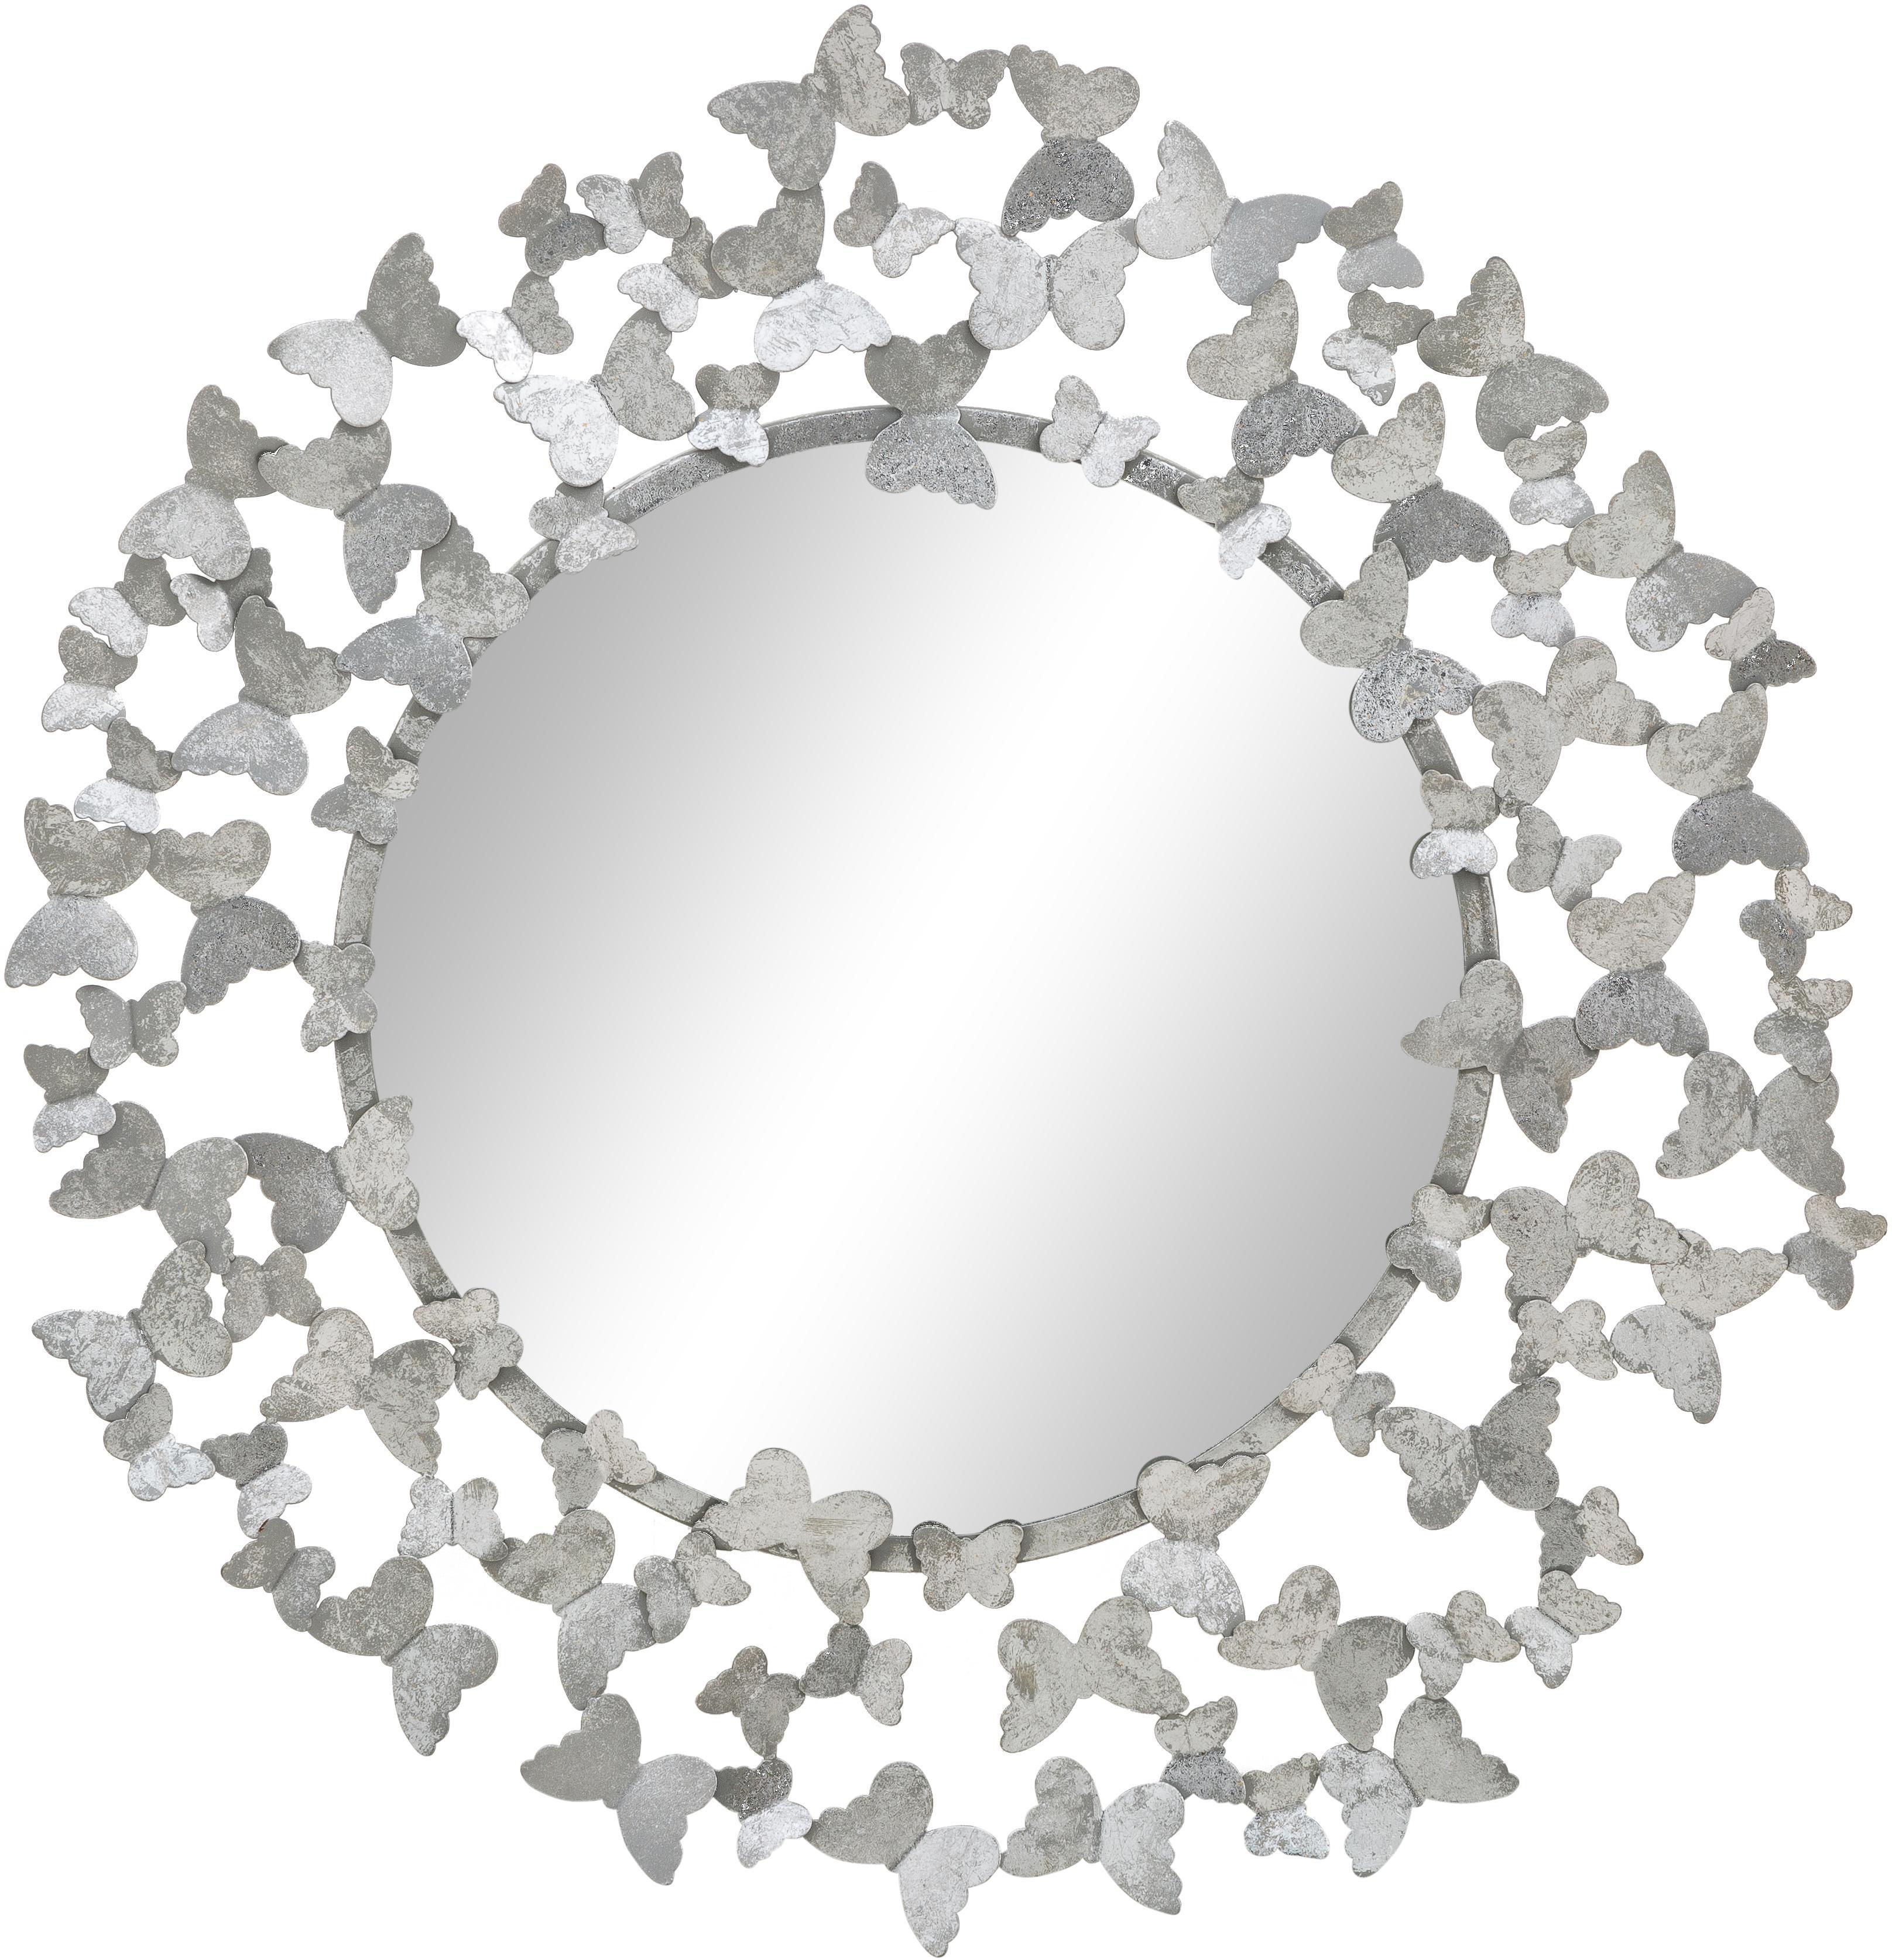 Lustro ścienne Butterfly, Odcienie srebrnego, Ø 67 cm